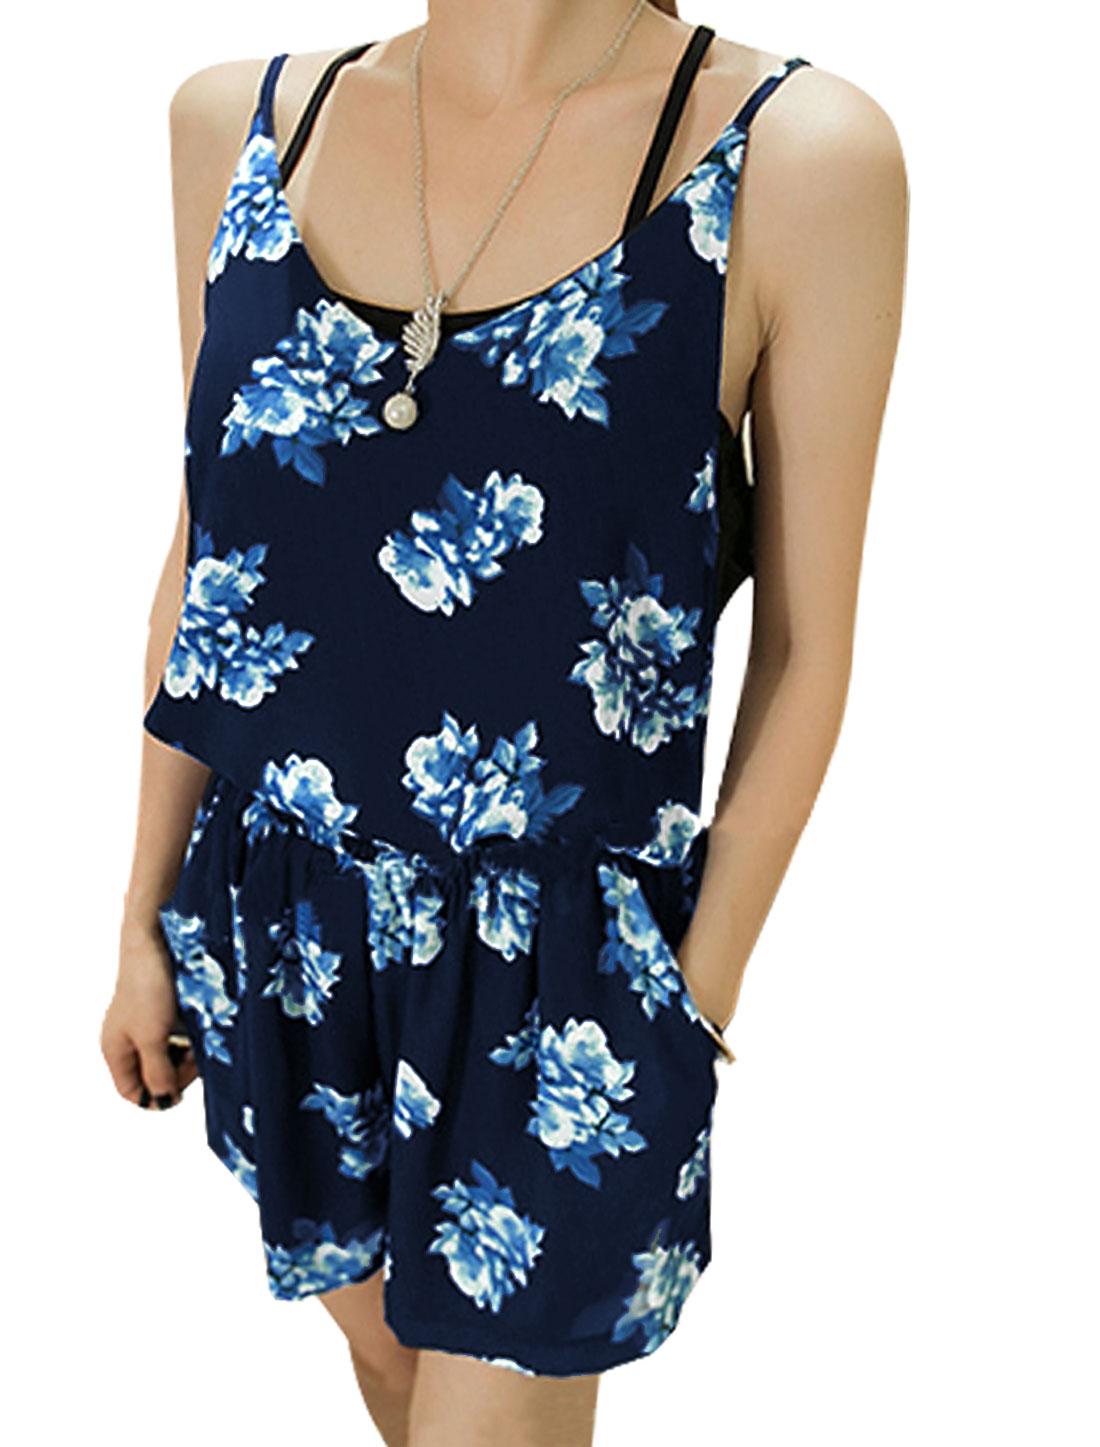 Lady Floral Prints Spaghetti Straps Cami w Stretchy Waist Shorts Navy Blue XS